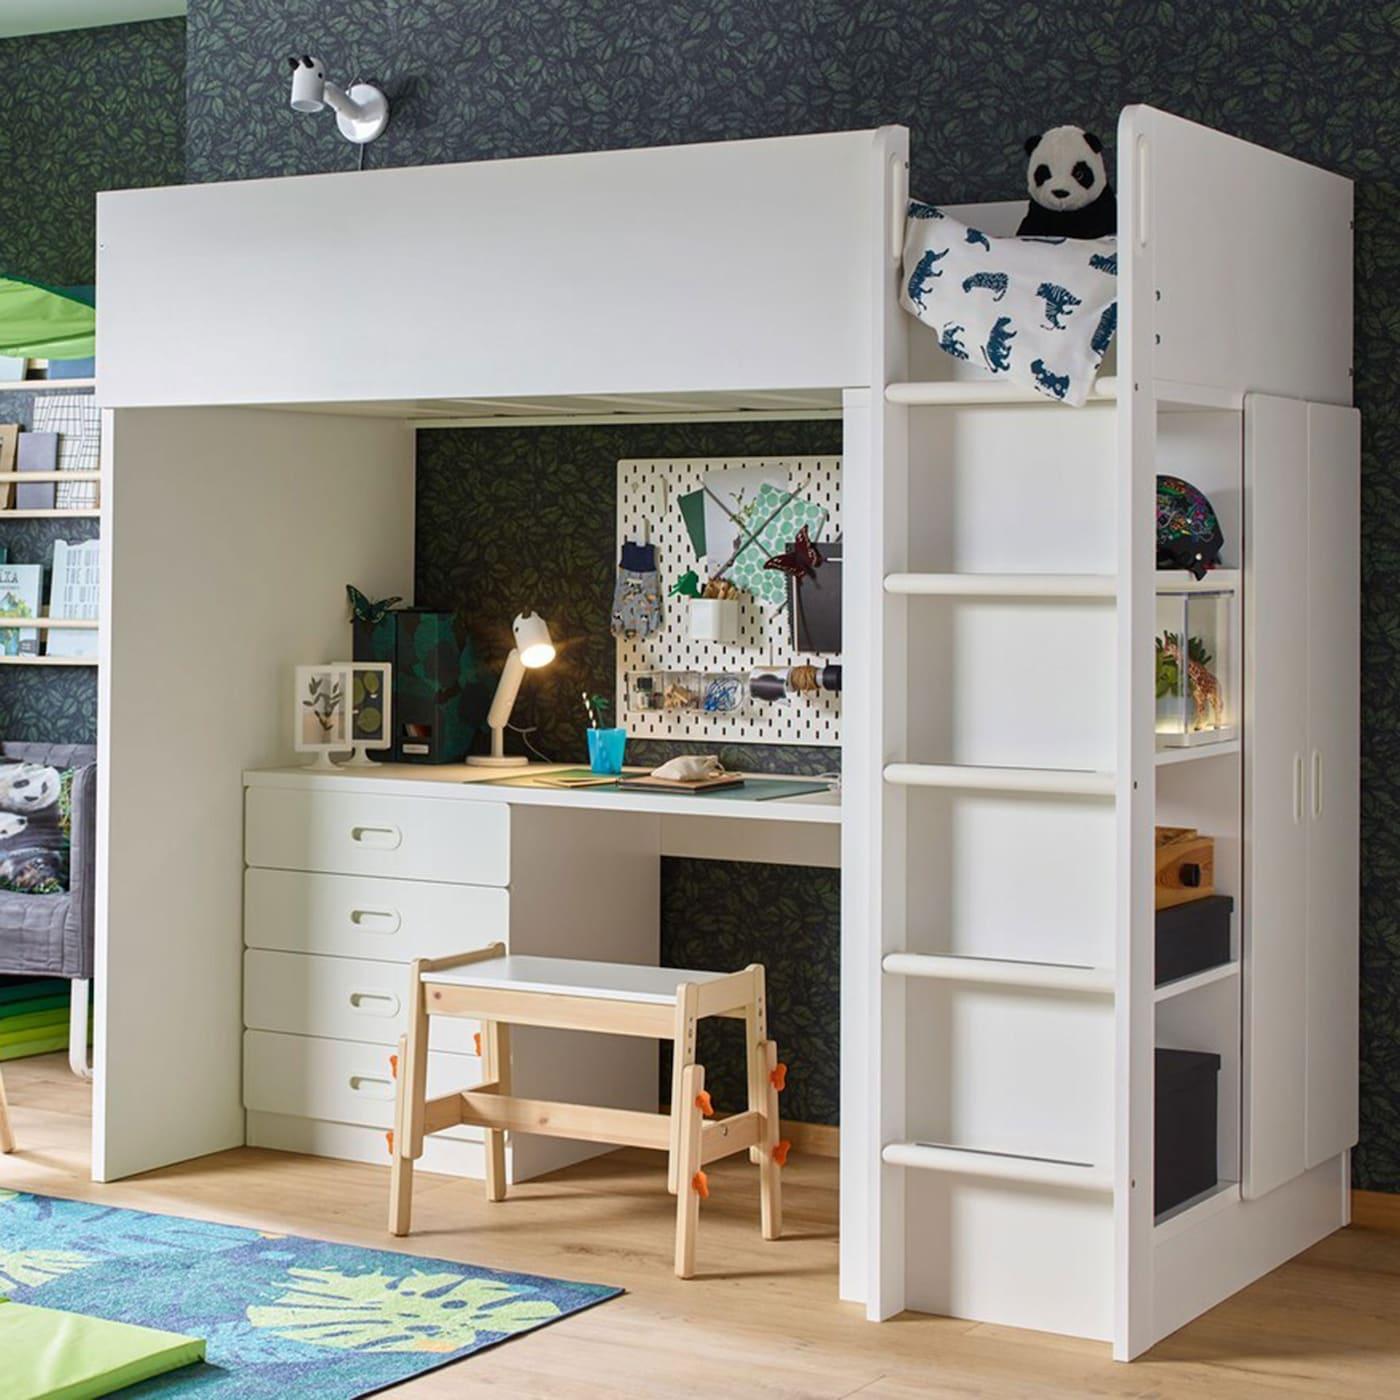 For Kids With Wild Ideas Ikea Ireland